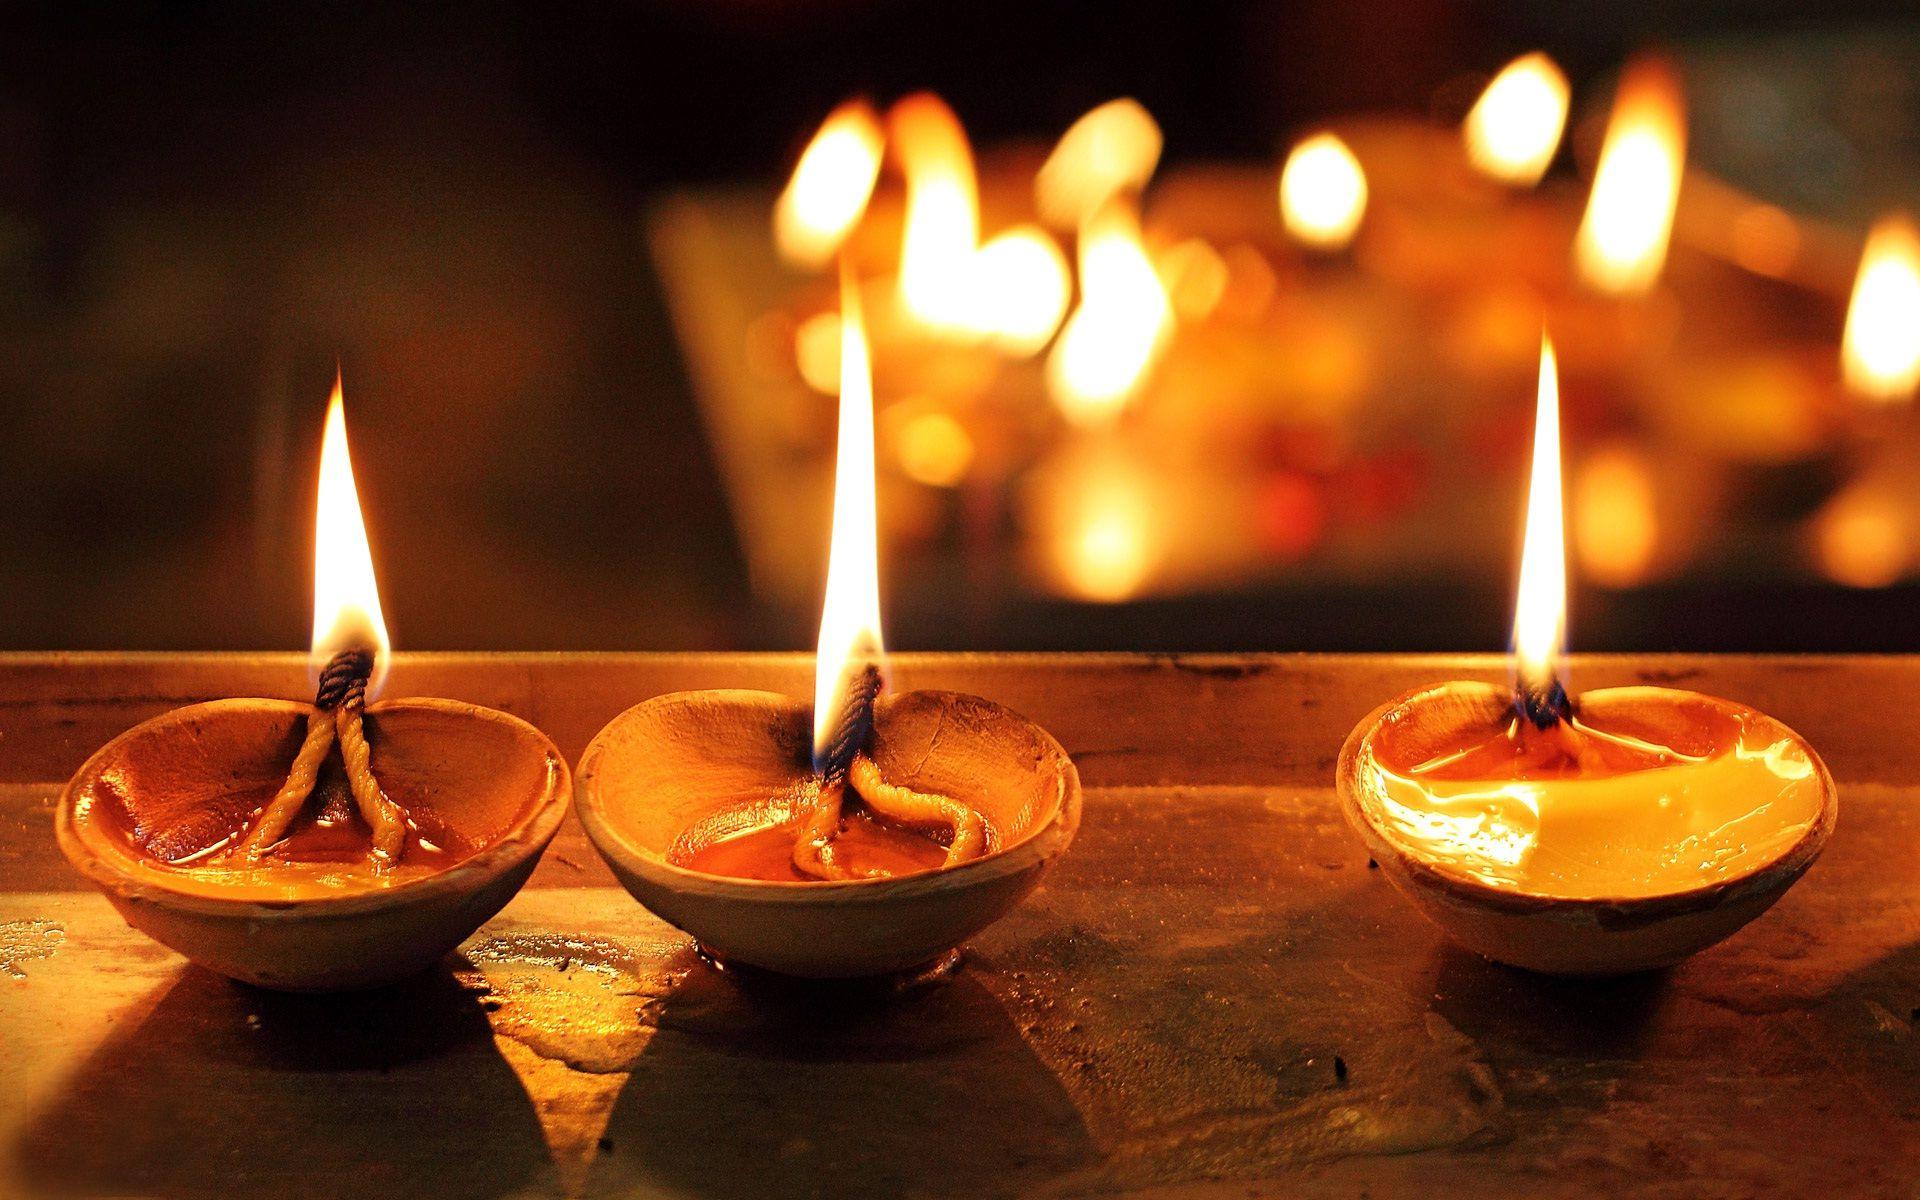 Diwali-lights-Diya-wallpaper.jpg | Yoga | Pinterest | Yoga for Diwali Diya Wallpaper  589hul